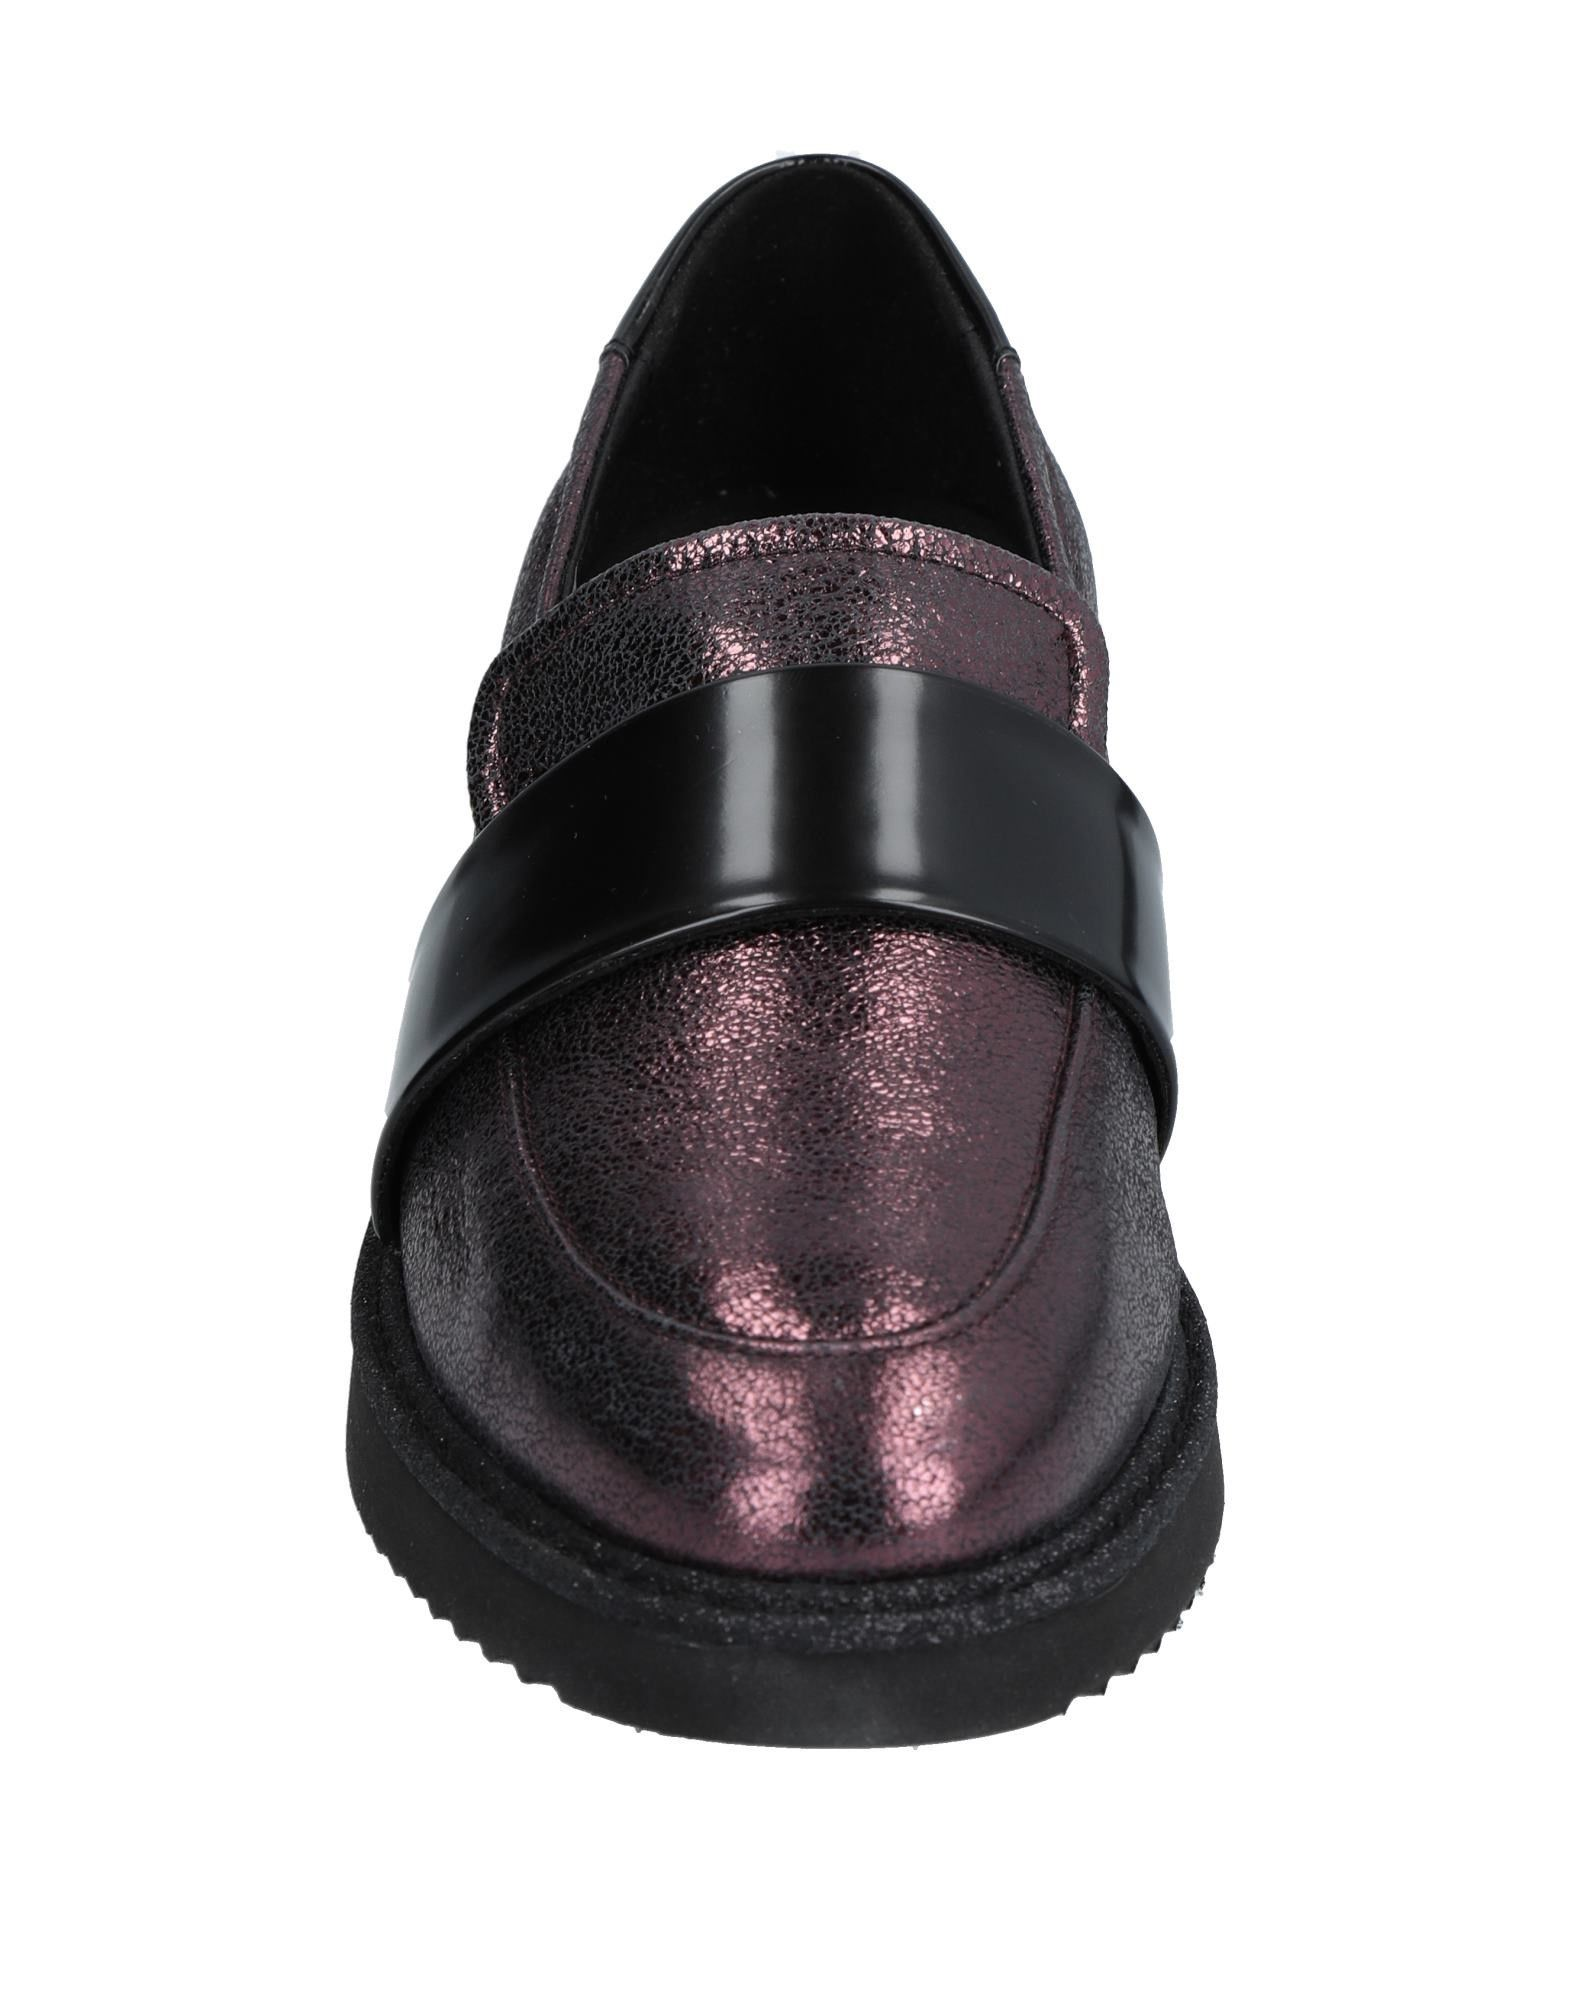 Geox Mokassins Damen  11541051WL Schuhe Gute Qualität beliebte Schuhe 11541051WL 71c122